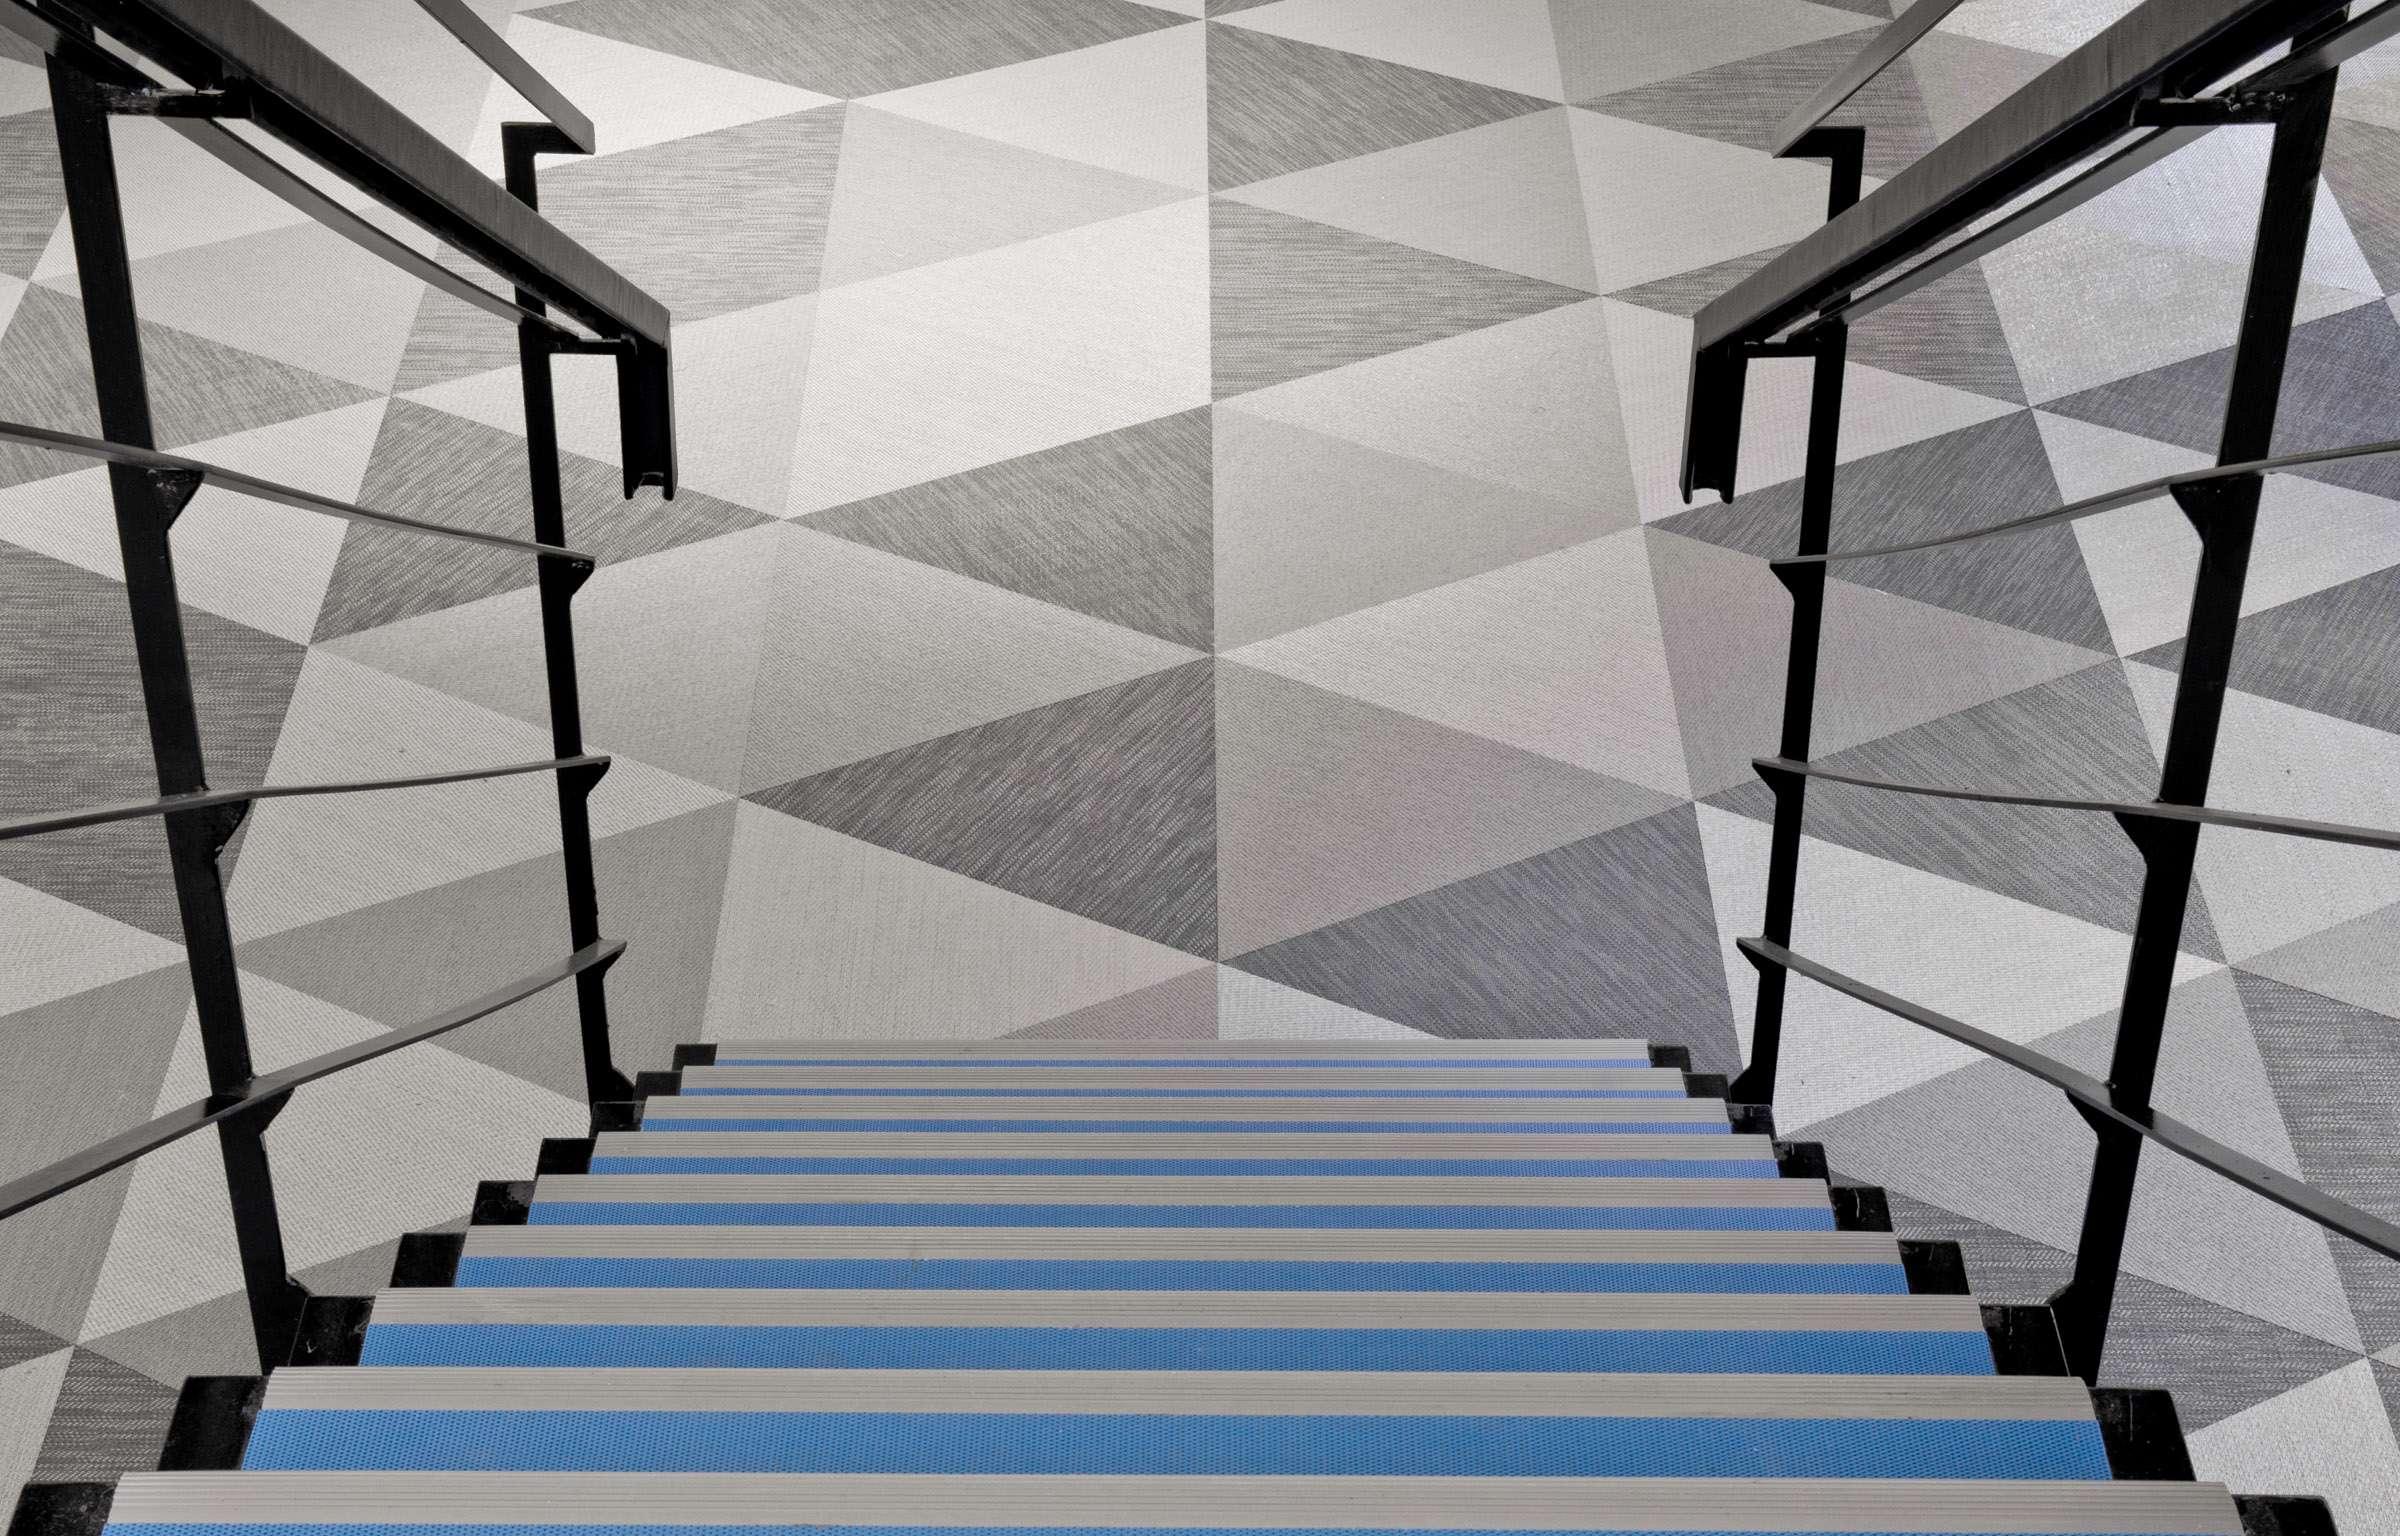 Geometric floor pattern using Bolon Studio™ Triangle tiles in the office of Skype in Stockholm, Sweden